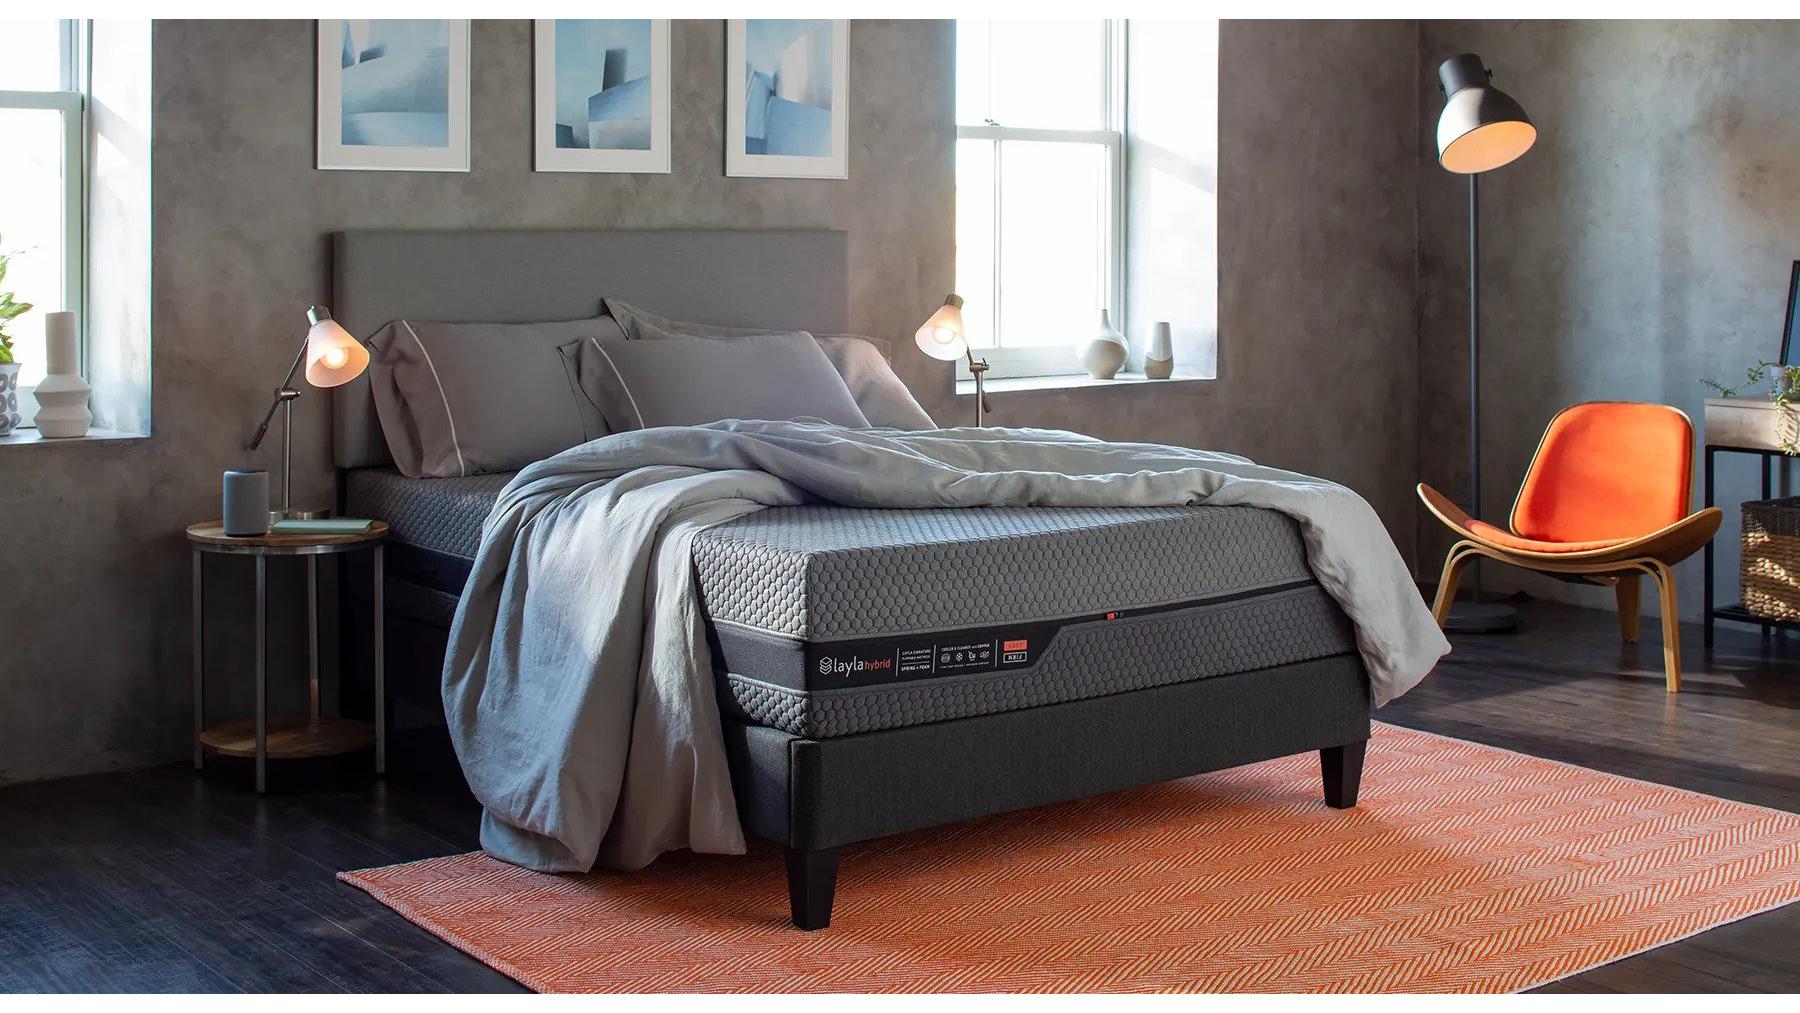 Layla Sleep Hybrid Mattress